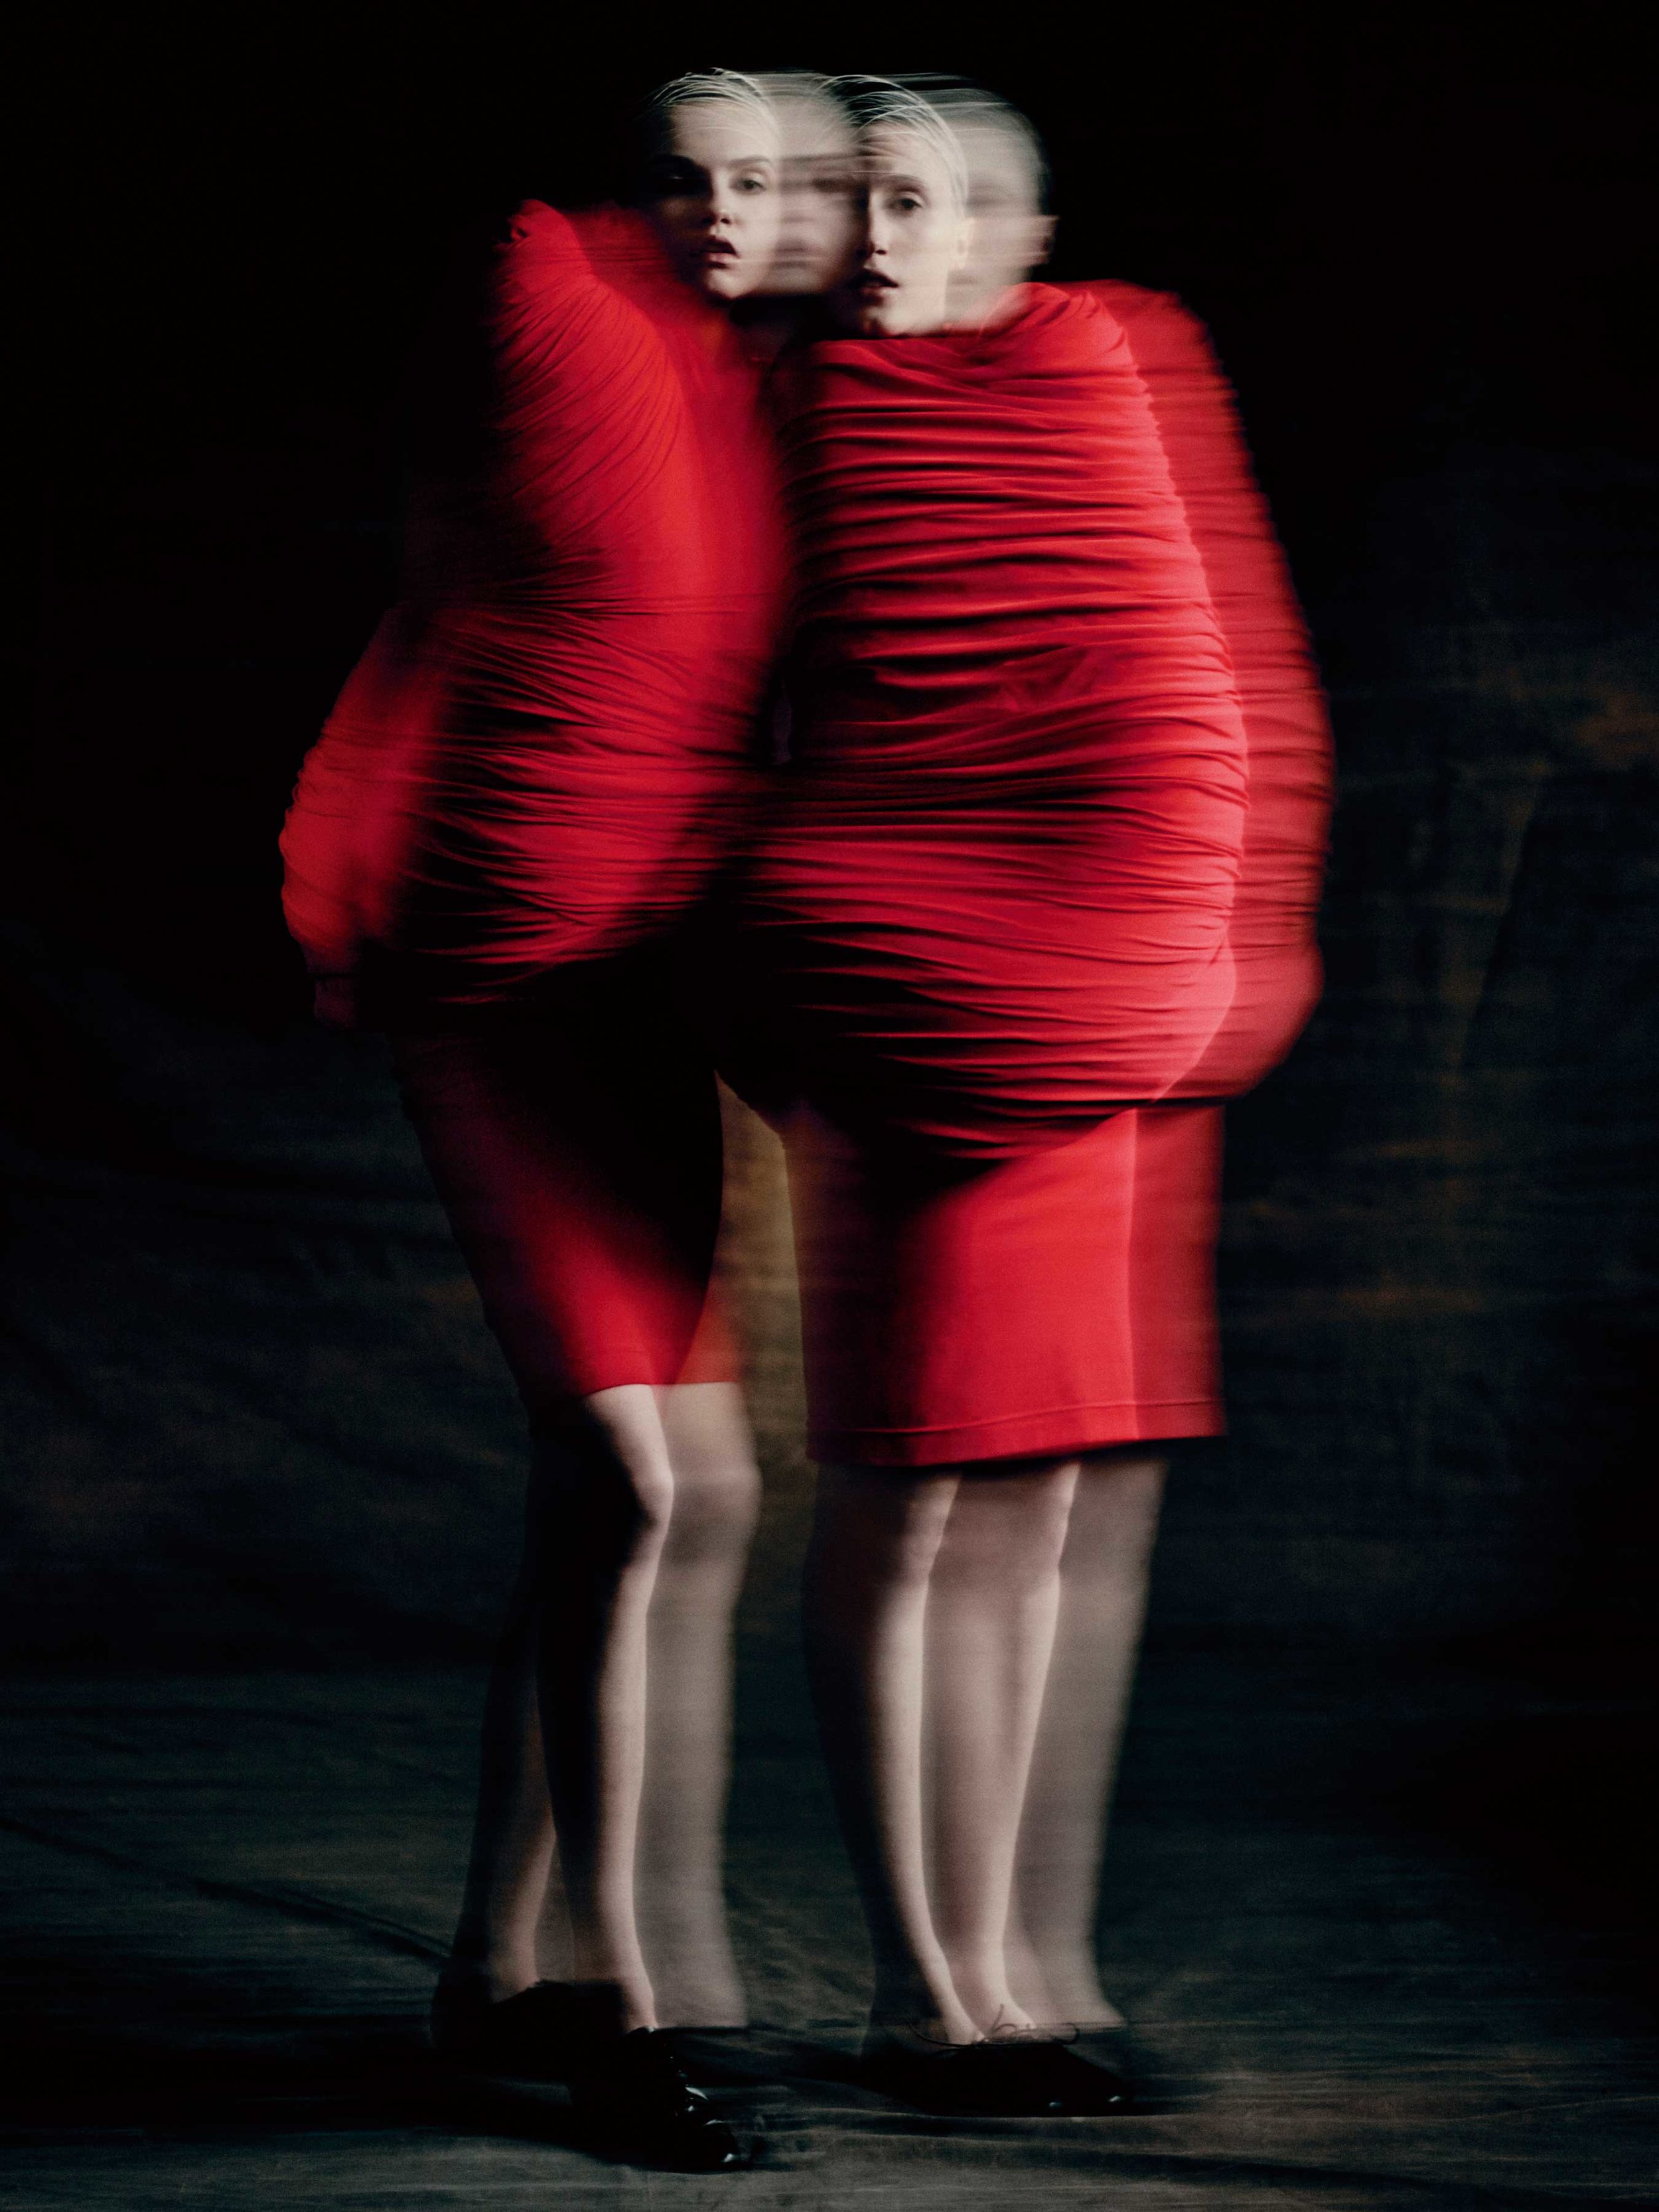 Rei Kawakubo for Comme des Garçons: Body Meets Dress–Dress Meets Body (S/S'97; Courtesy of Comme des Garcons). Photograph by © Paolo Roversi; Courtesy of The Metropolitan Museum of Art